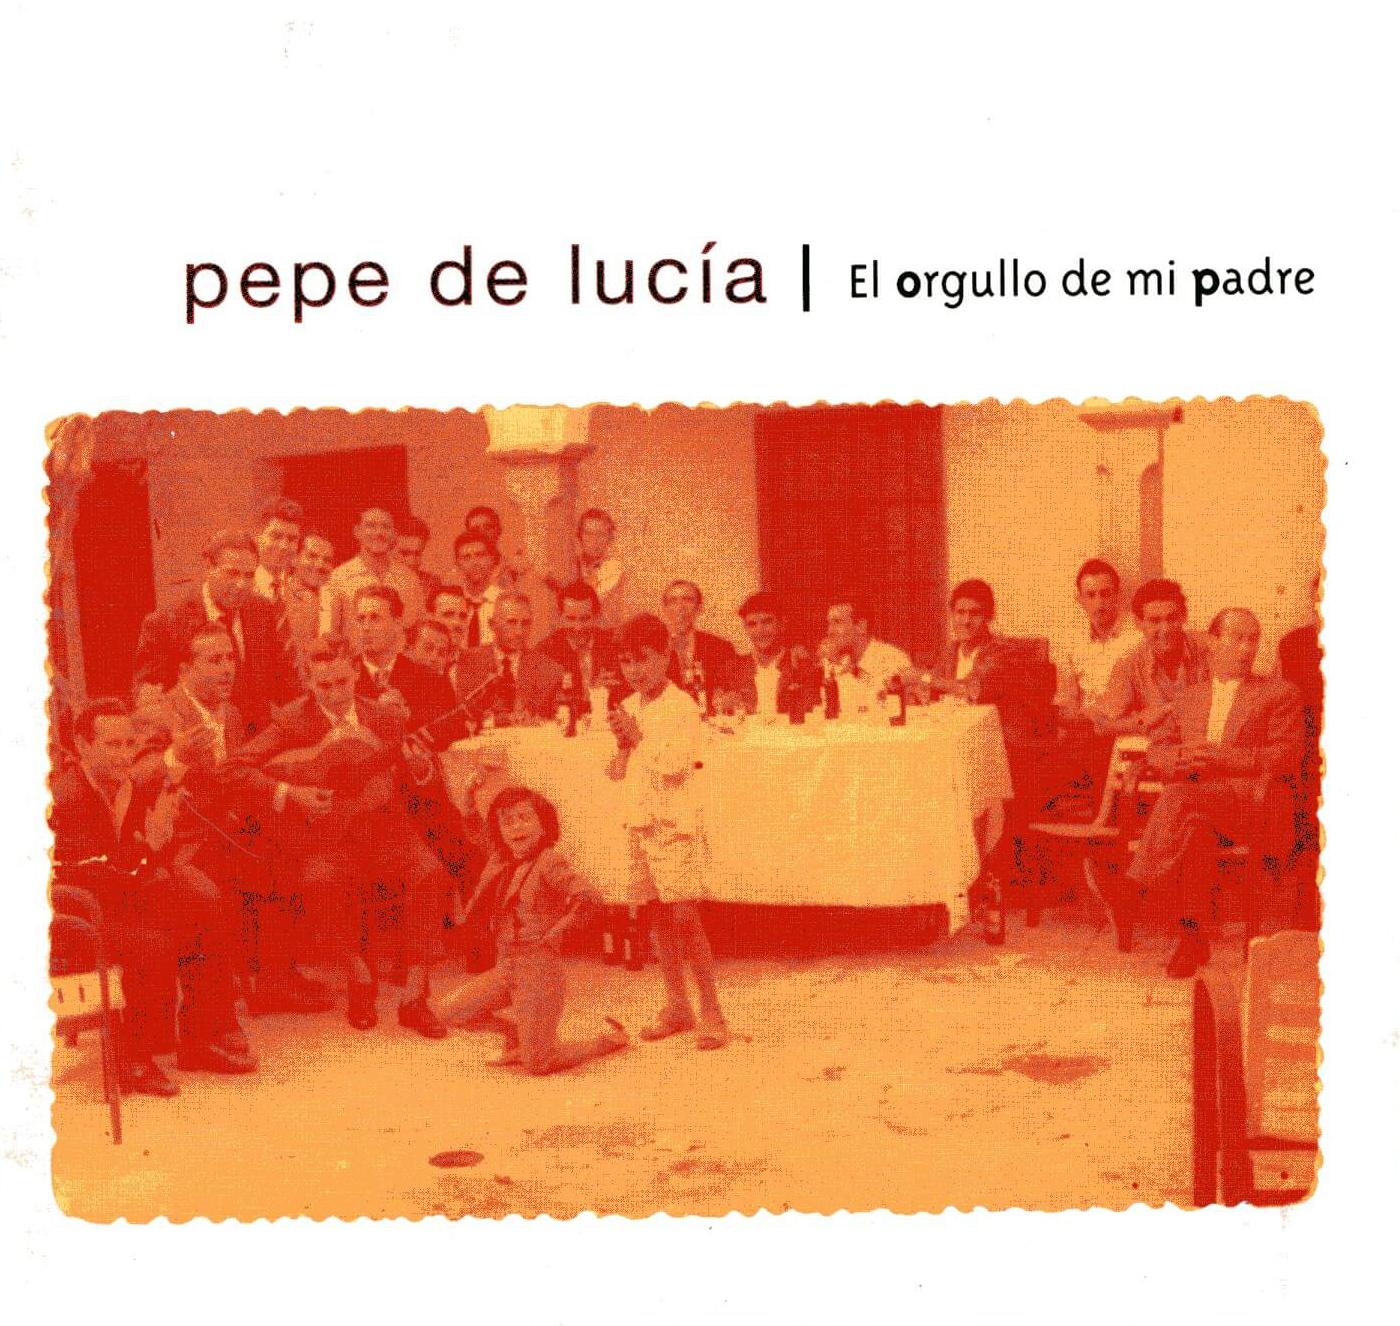 PEPE DE LUCÍA | EL ORGULLO DE MI PADRE